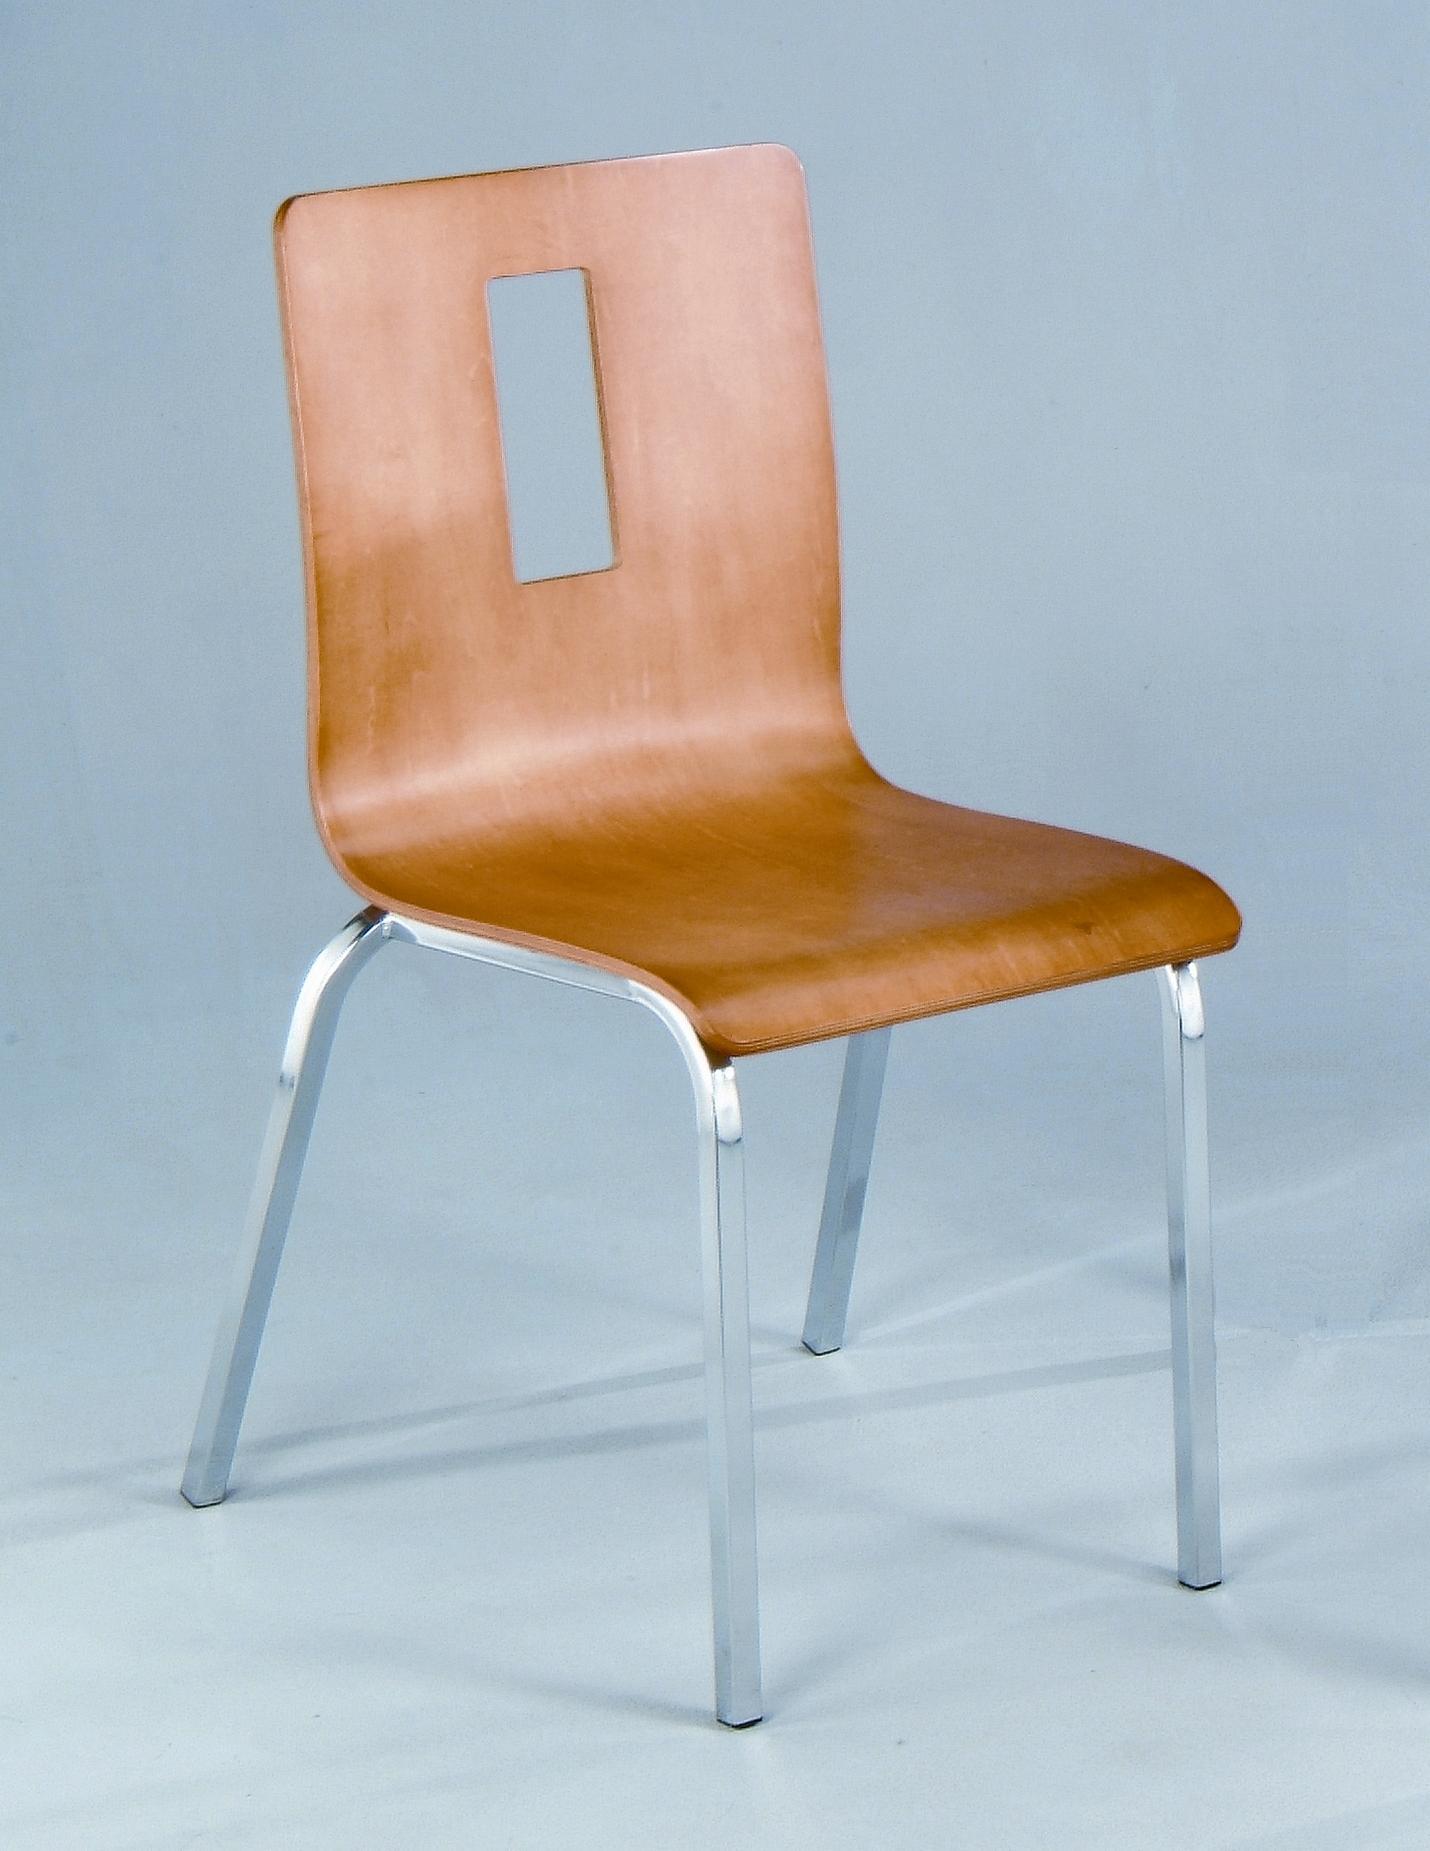 Sam Yi Furniture Manufacturer In Dining Room Chair Home Furniture Restaurant Furniture Sam